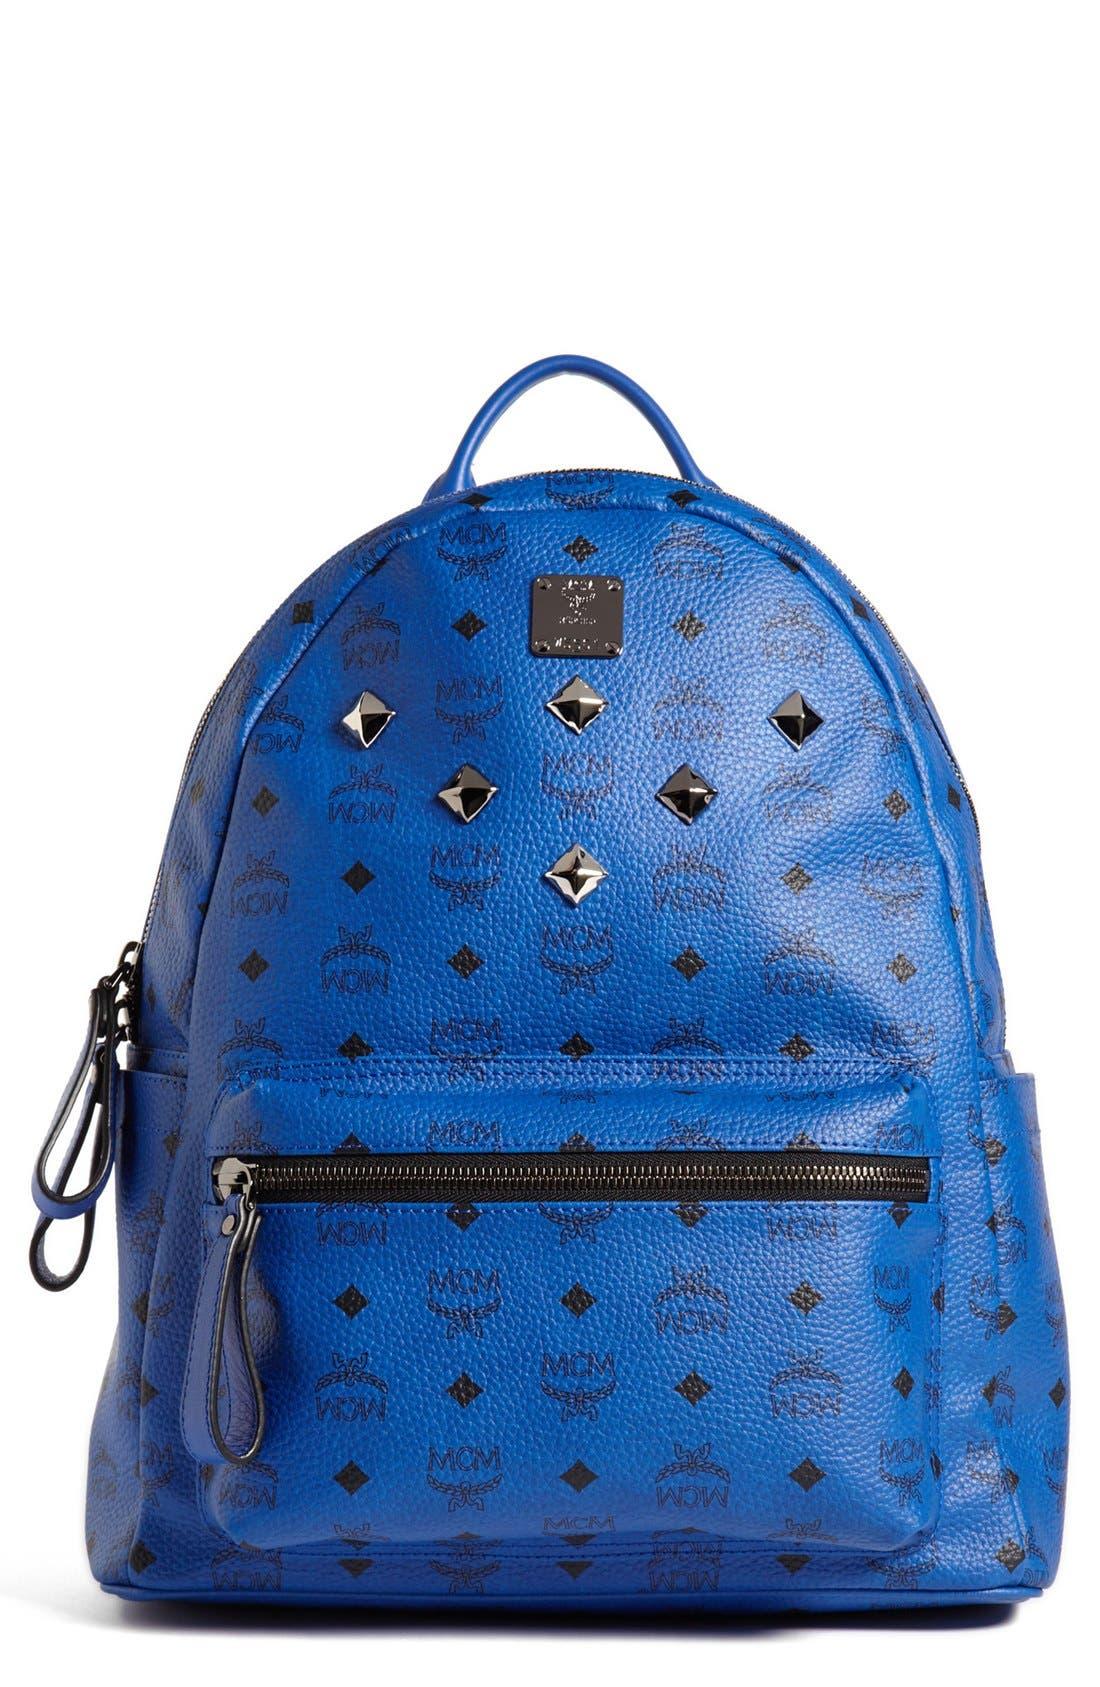 Alternate Image 1 Selected - MCM 'Sprinkle Stud - Medium' Coated Canvas Backpack